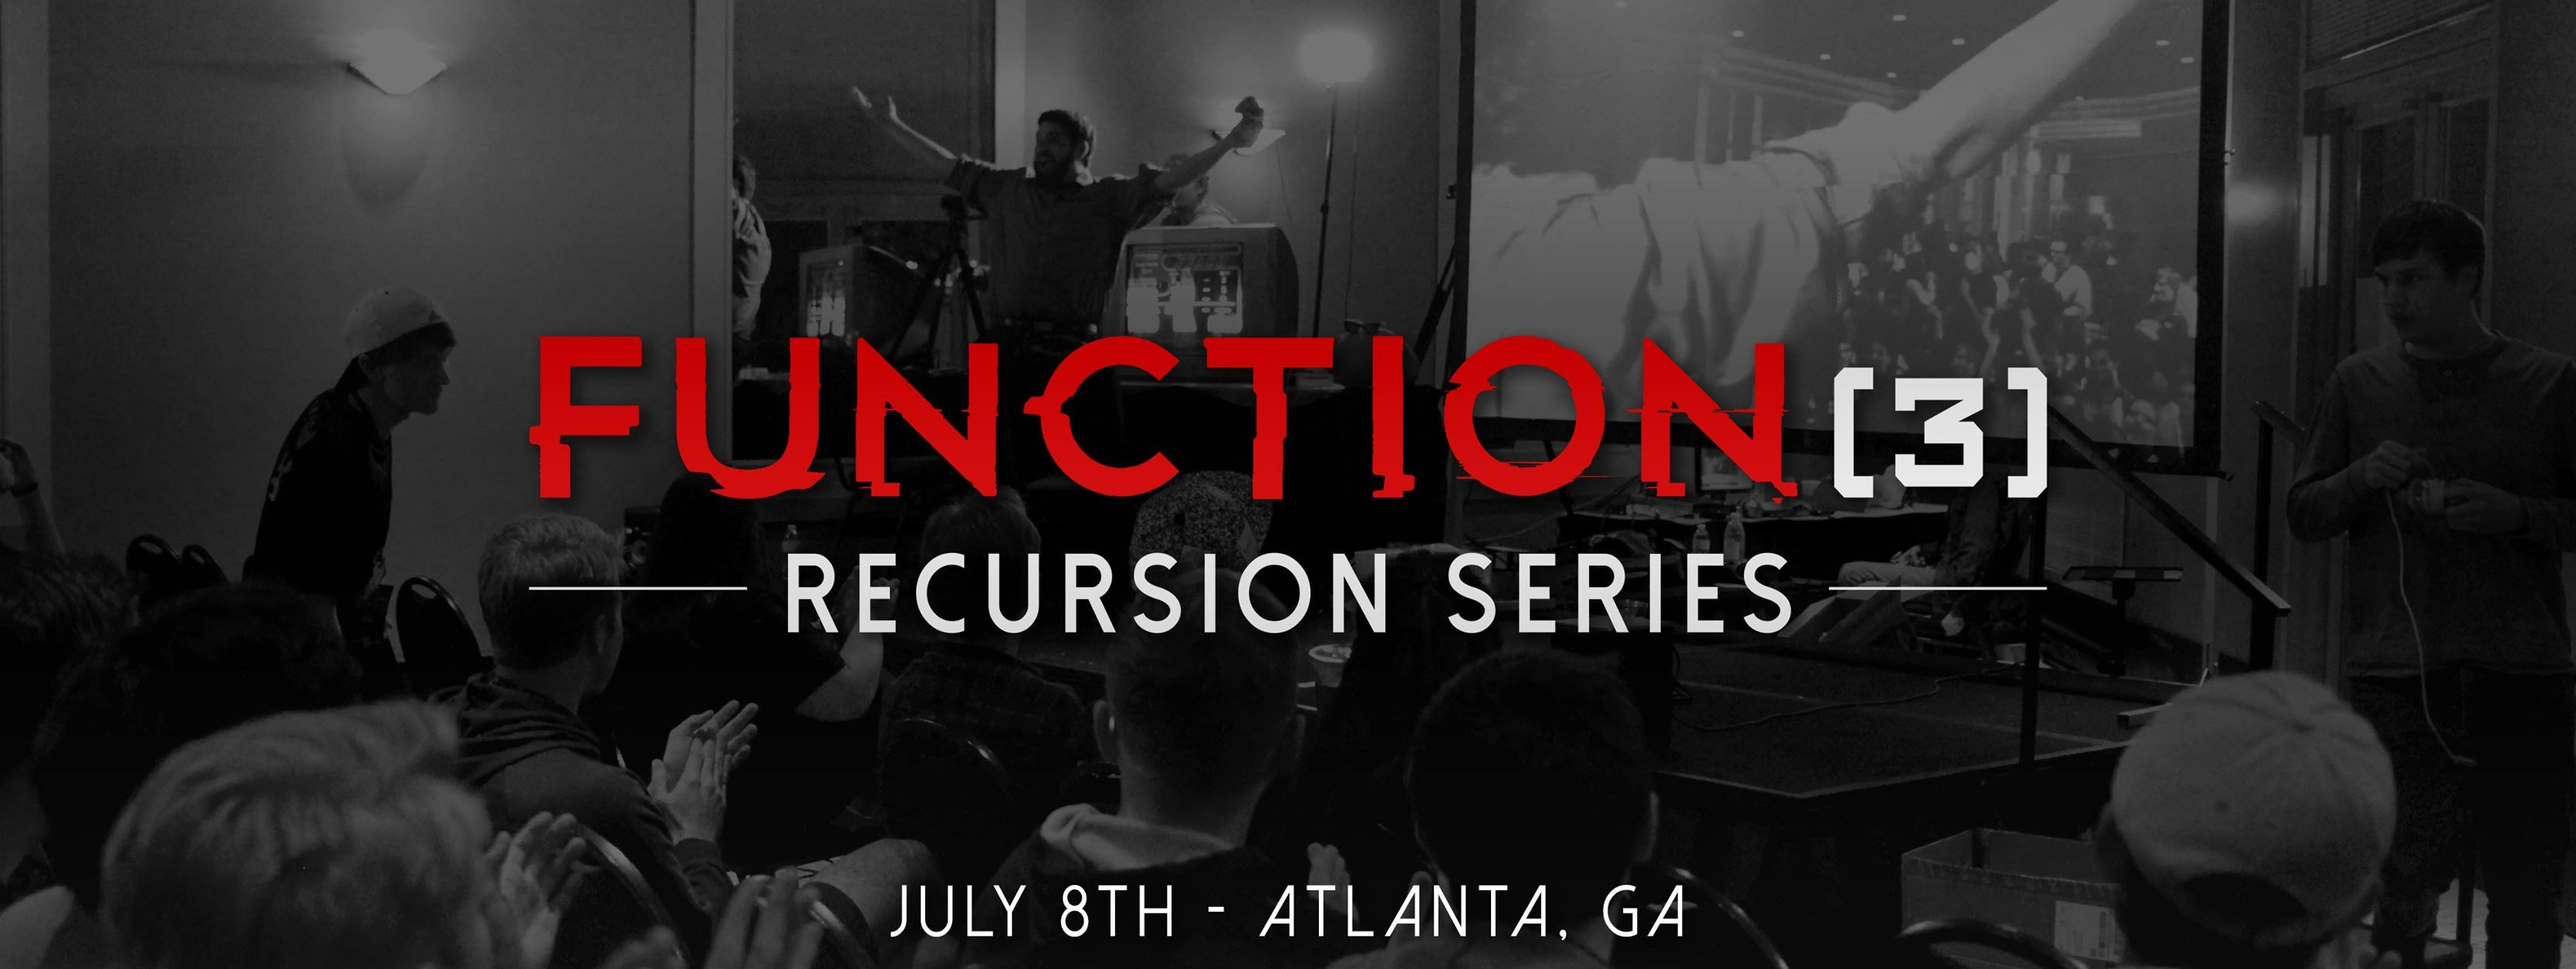 Function(3) - Recursion Series - Melee Singles